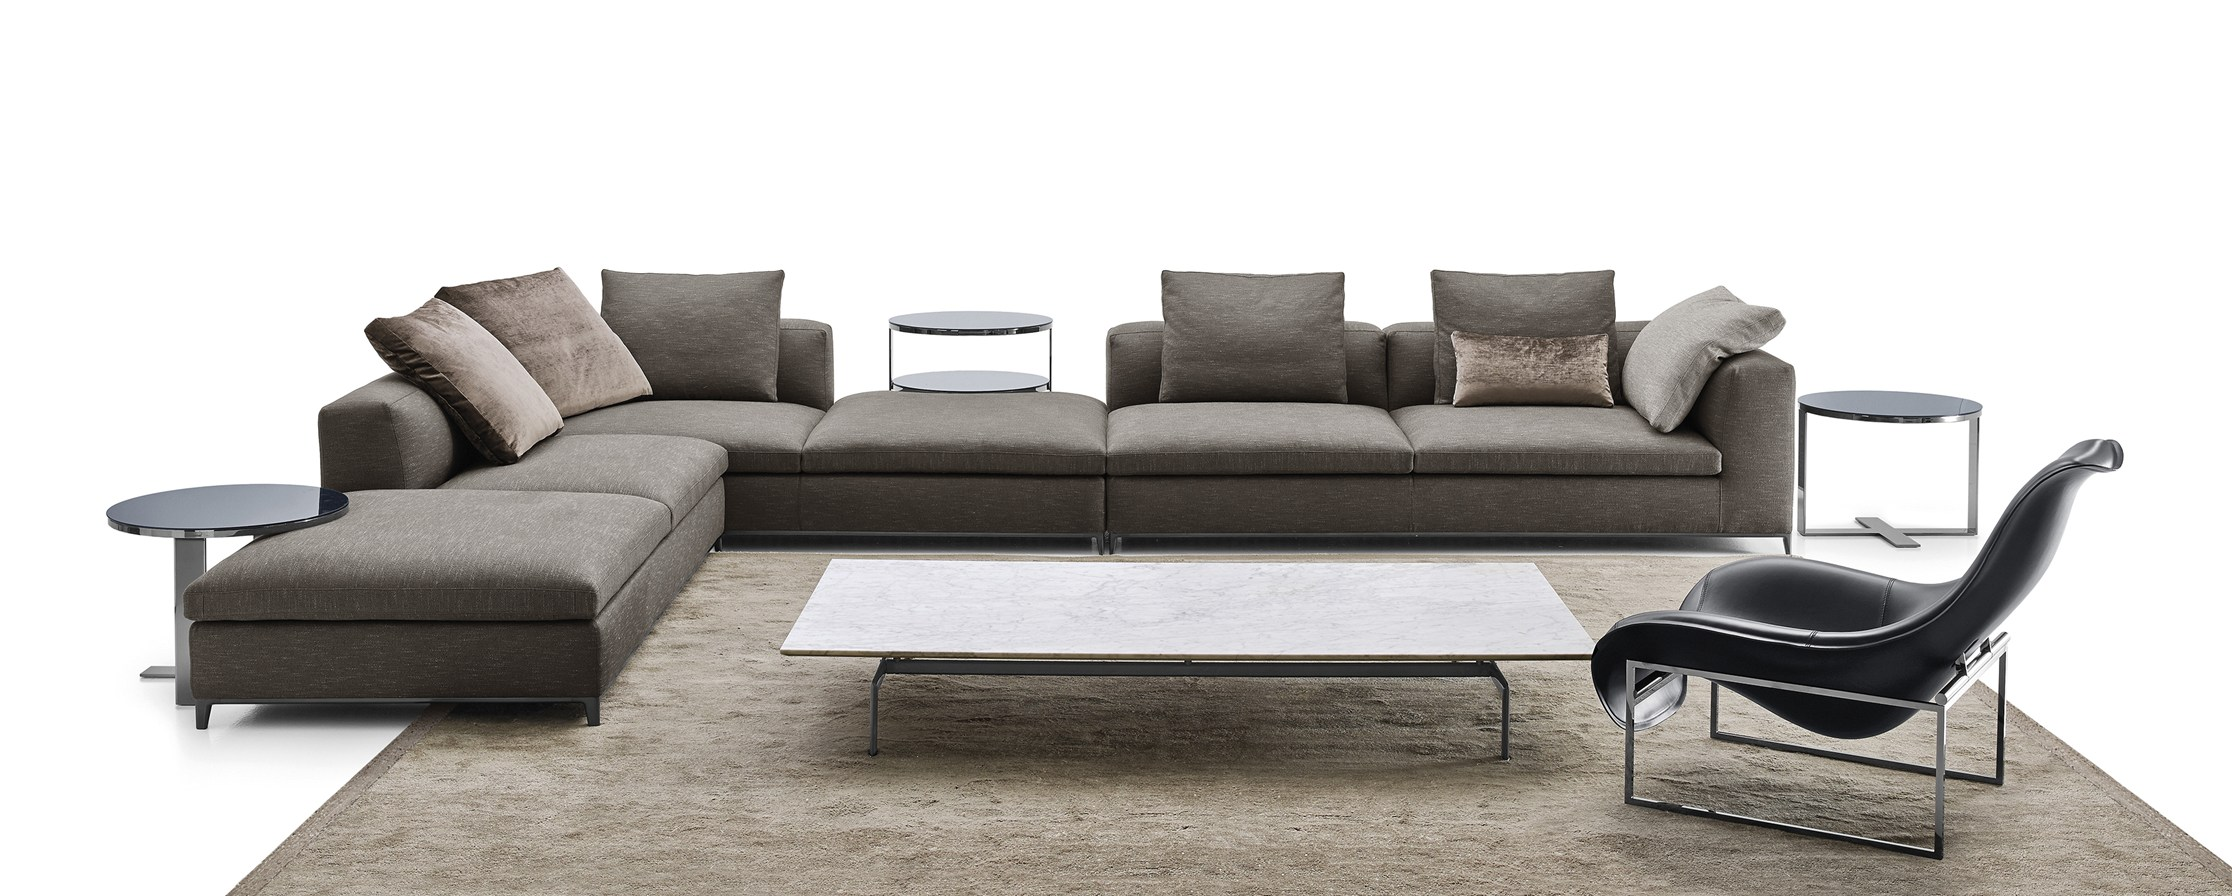 b b italia e maxalto a icff. Black Bedroom Furniture Sets. Home Design Ideas